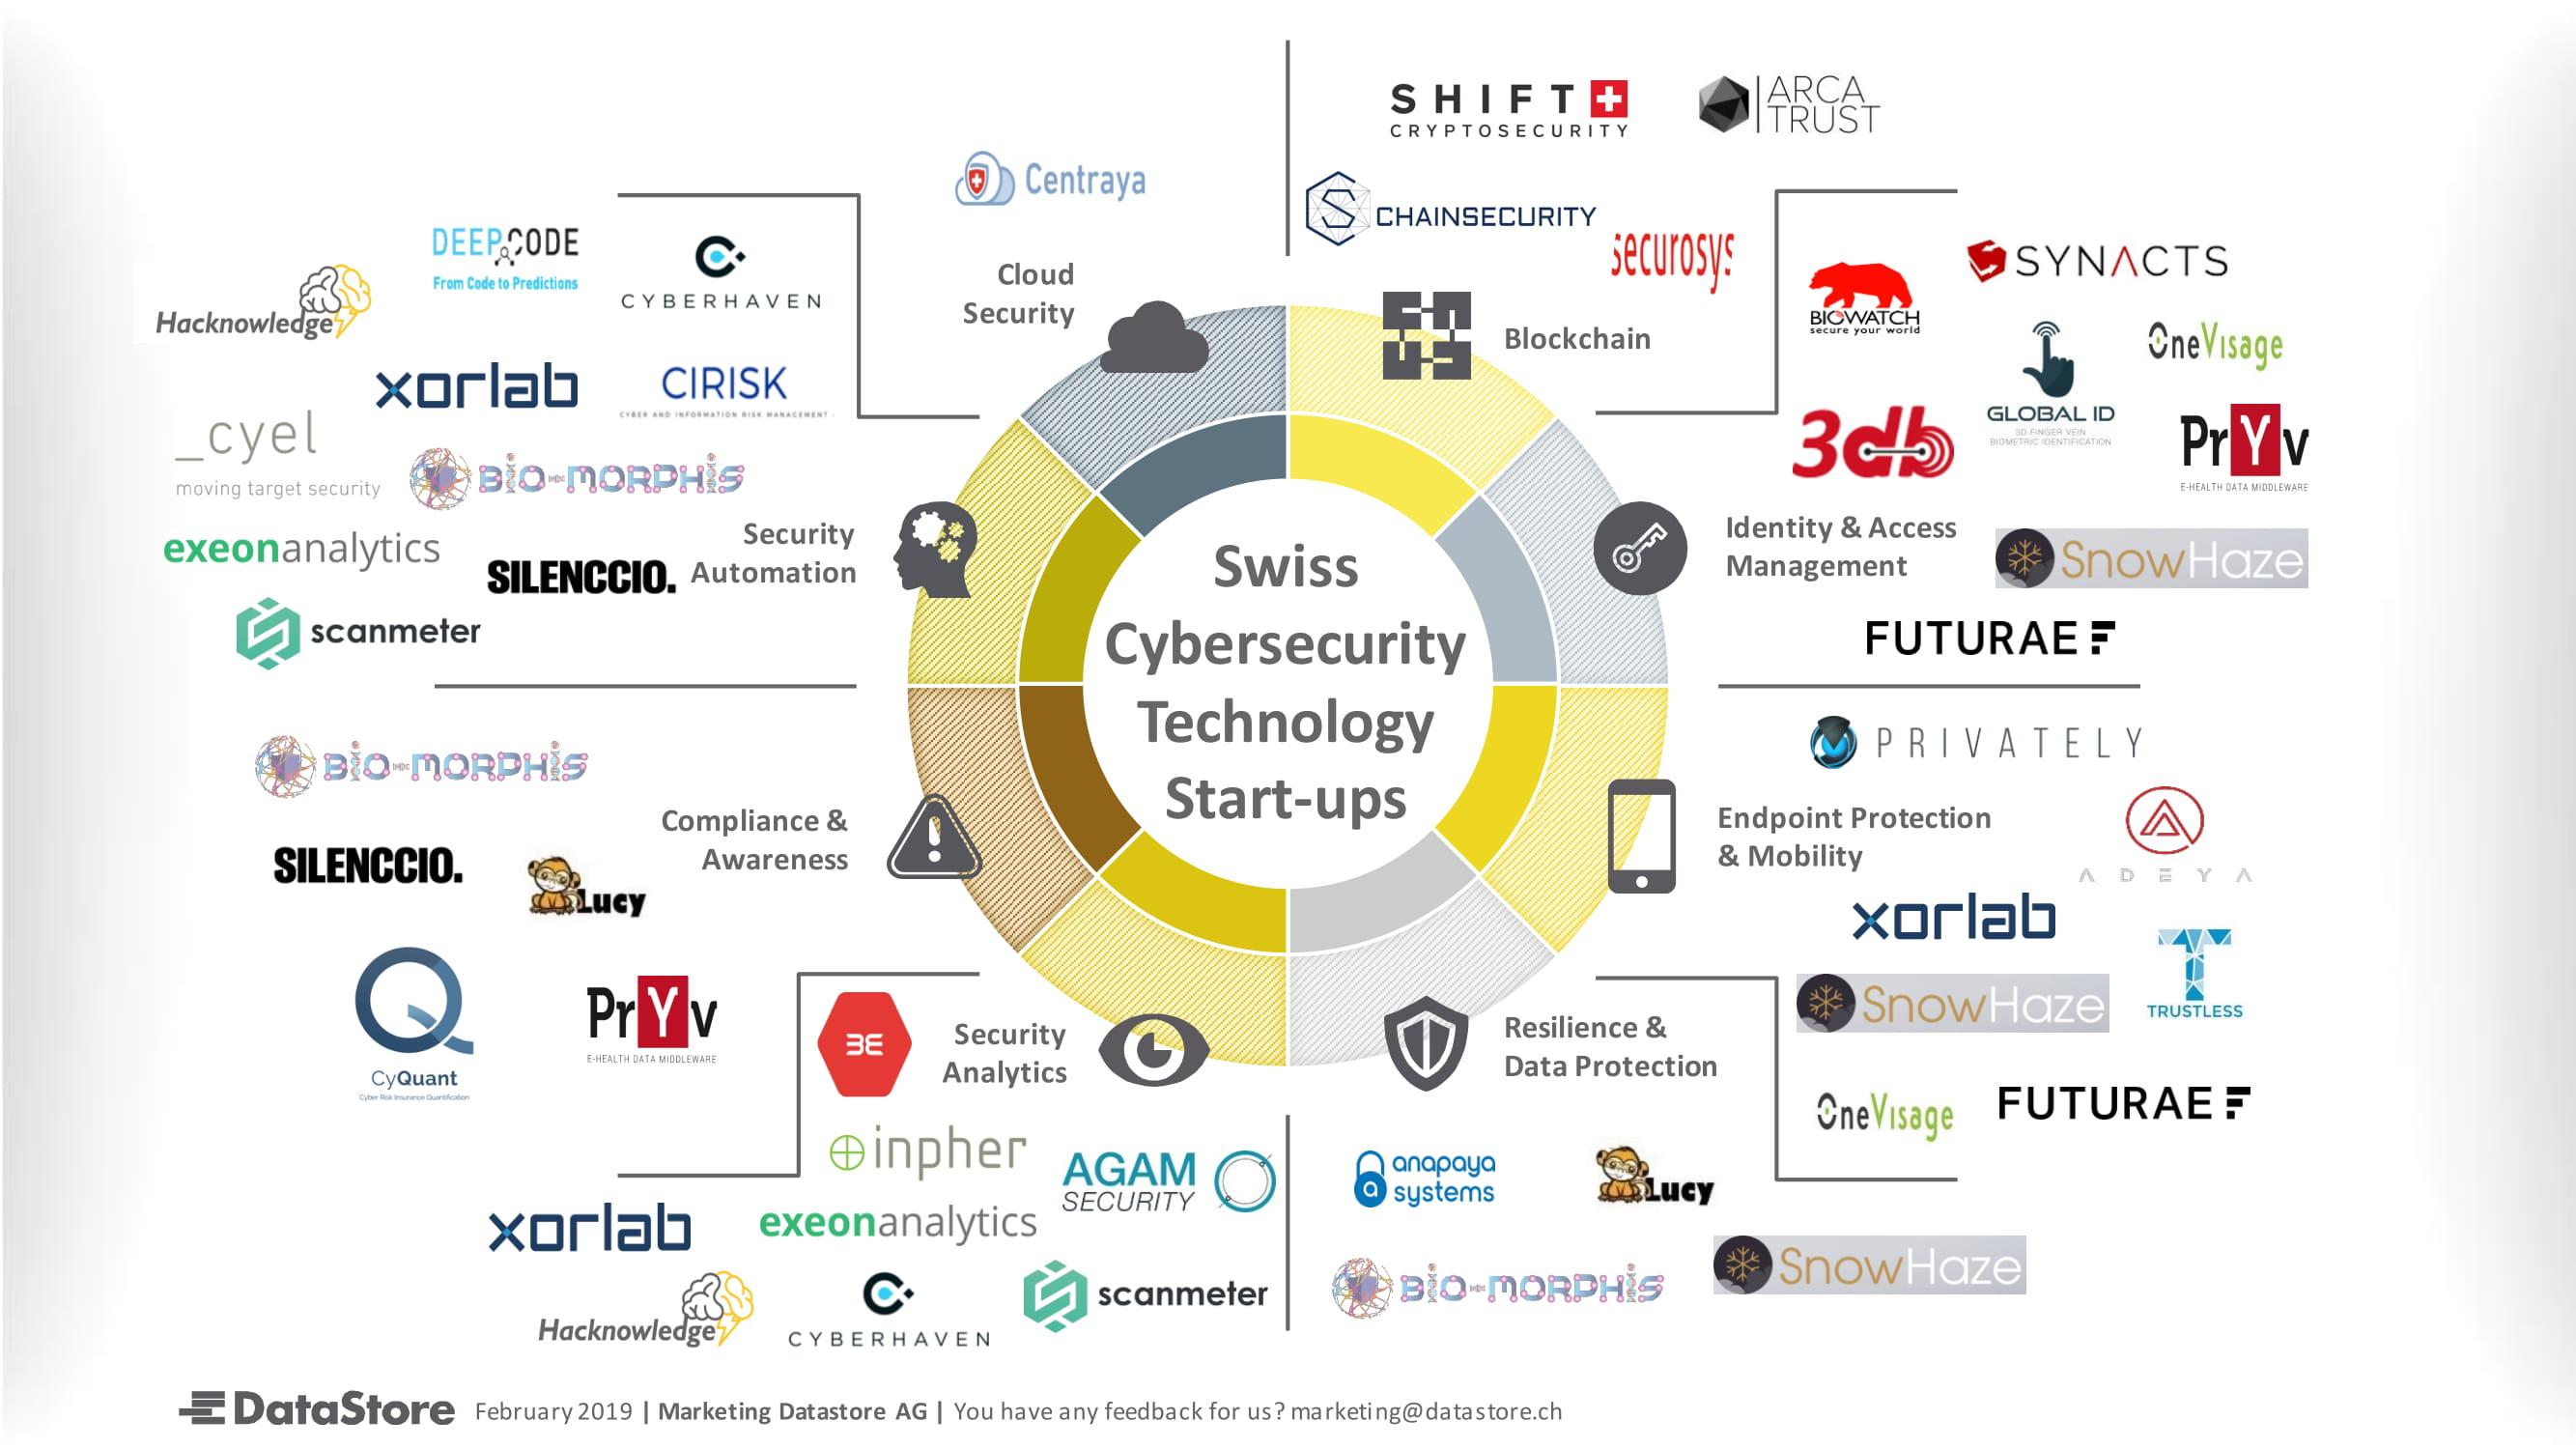 Swiss Cybersecurity Technology Start-ups